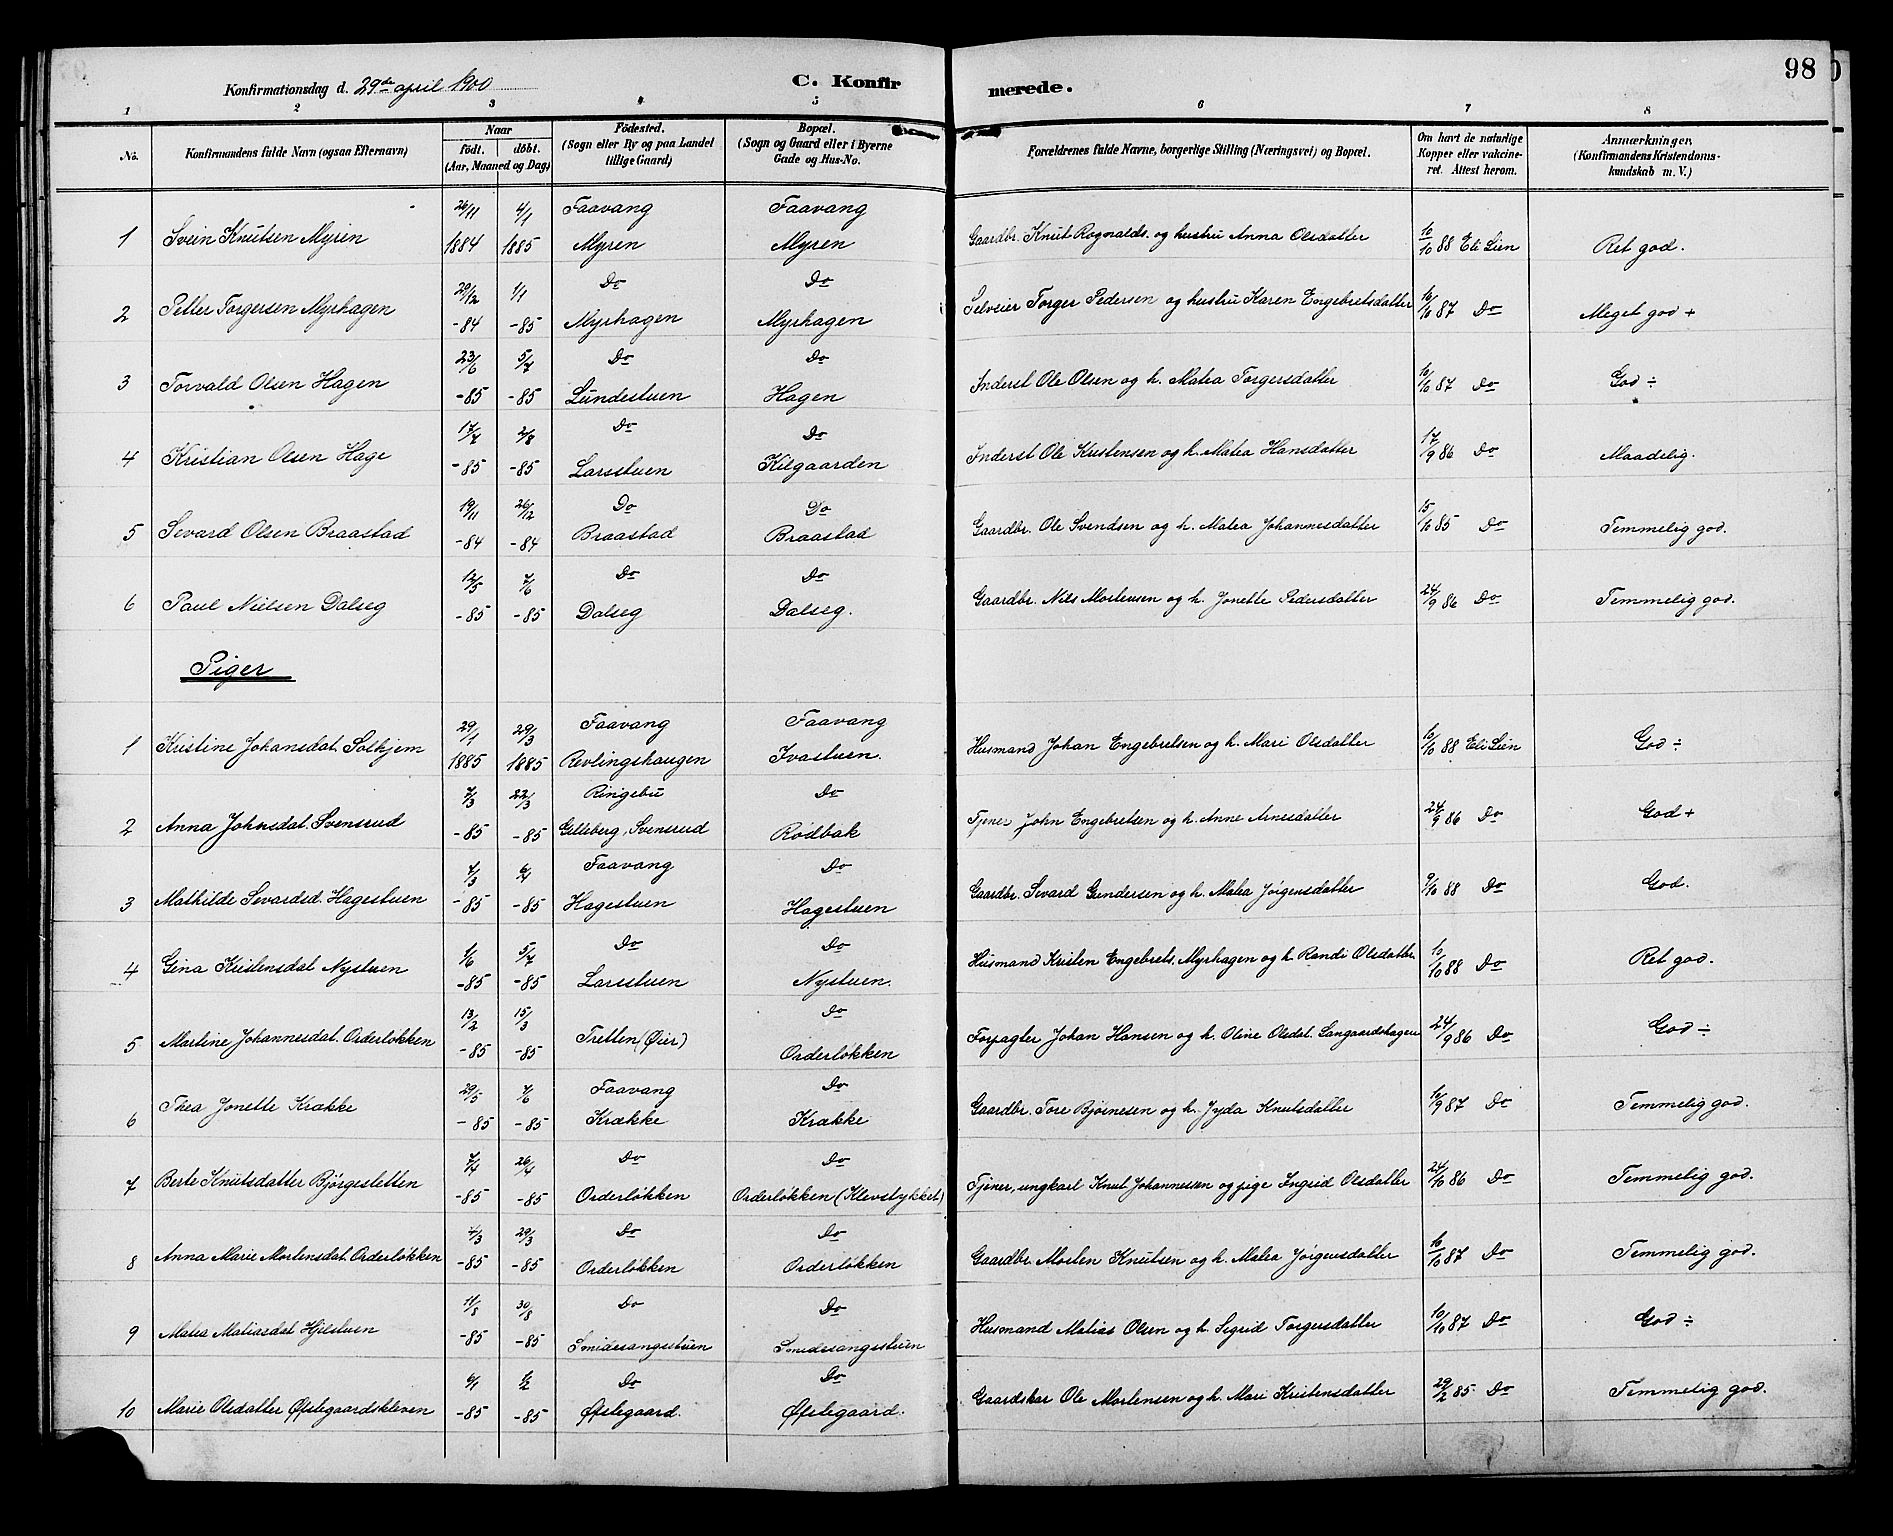 SAH, Ringebu prestekontor, Klokkerbok nr. 7, 1890-1910, s. 98